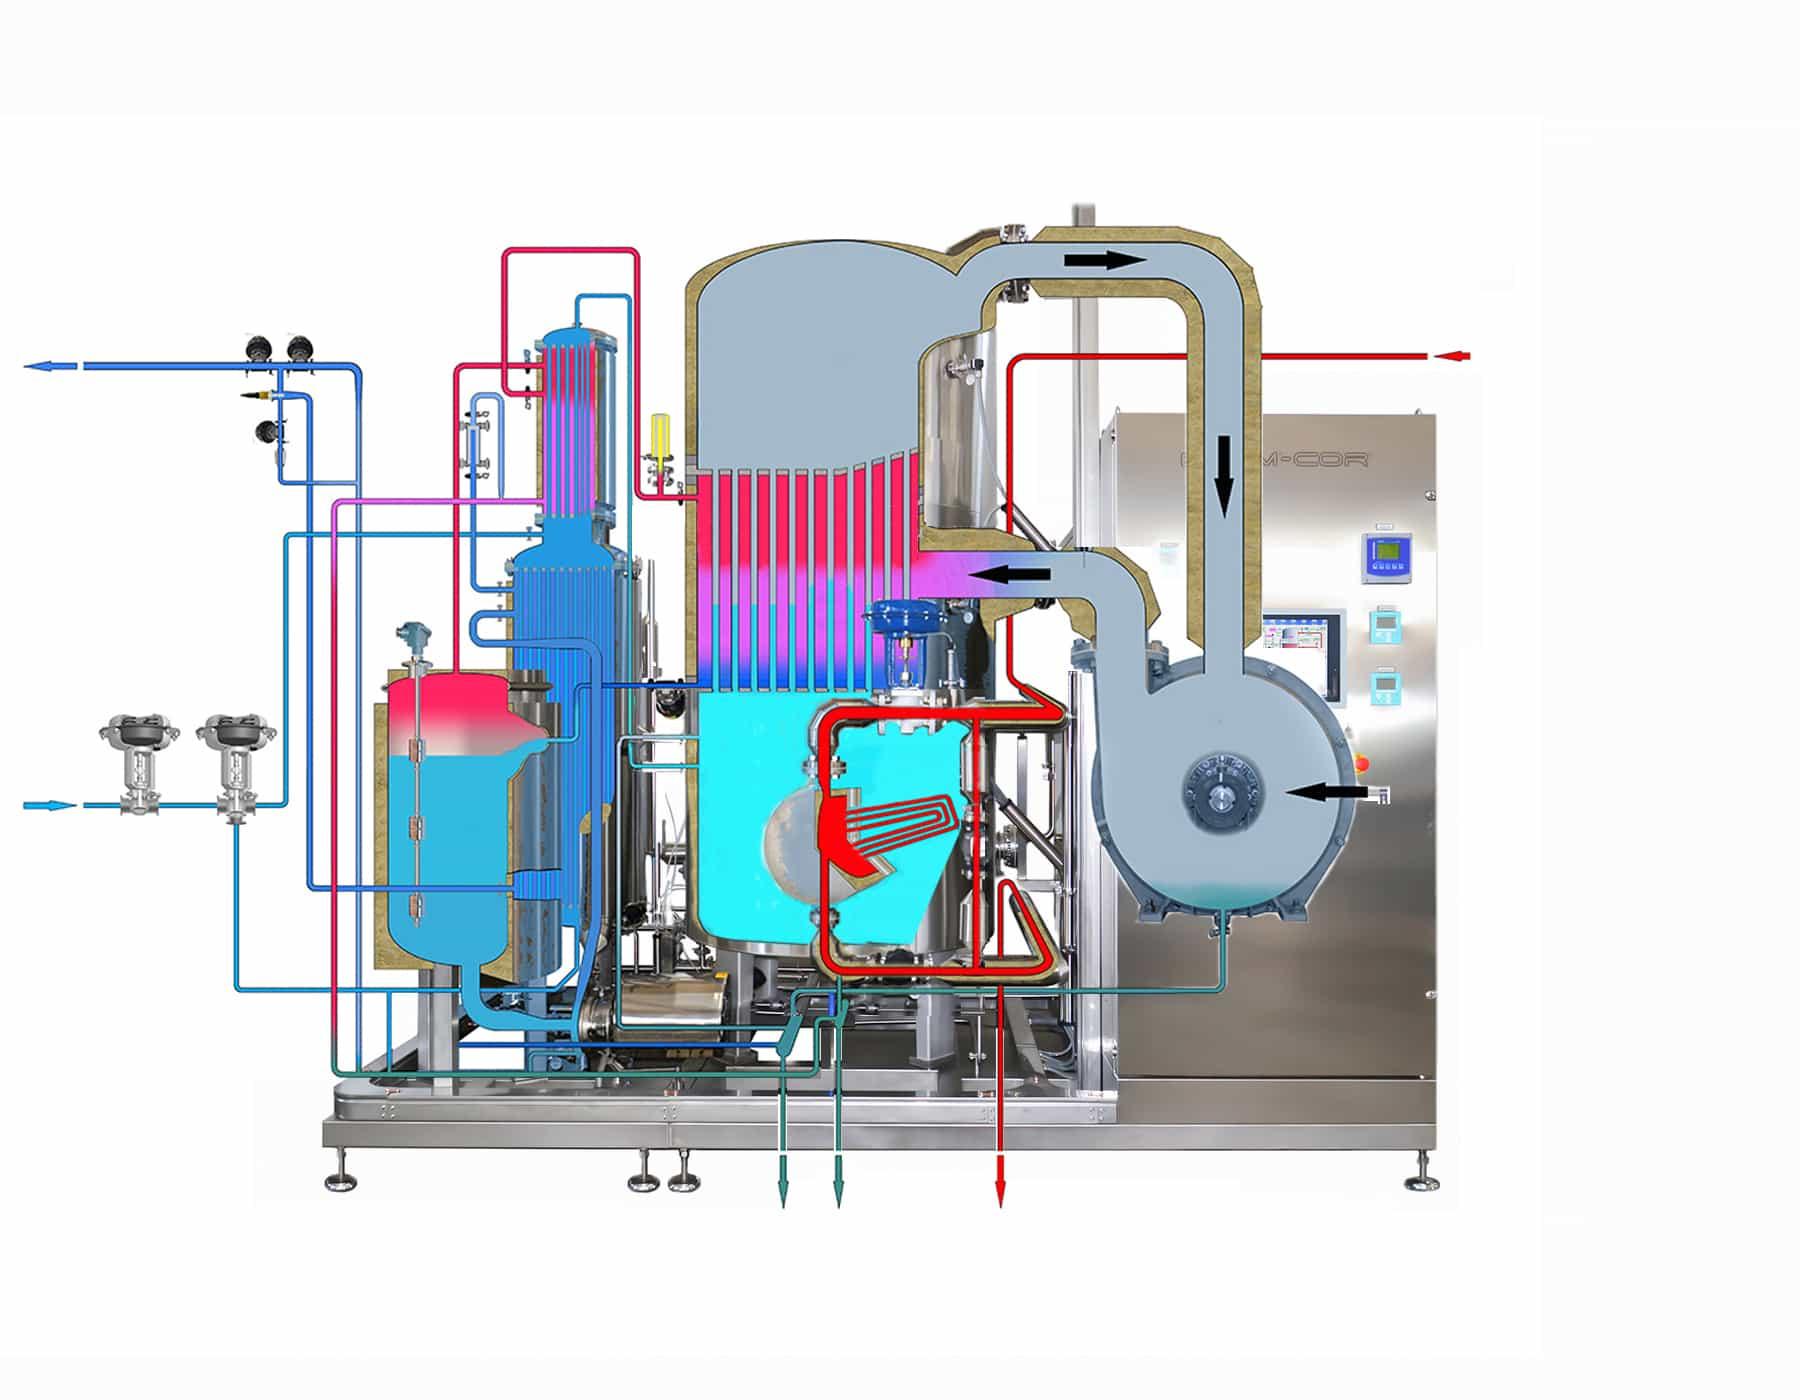 Bram-Cor vapor compression distillation process - Step 9-10